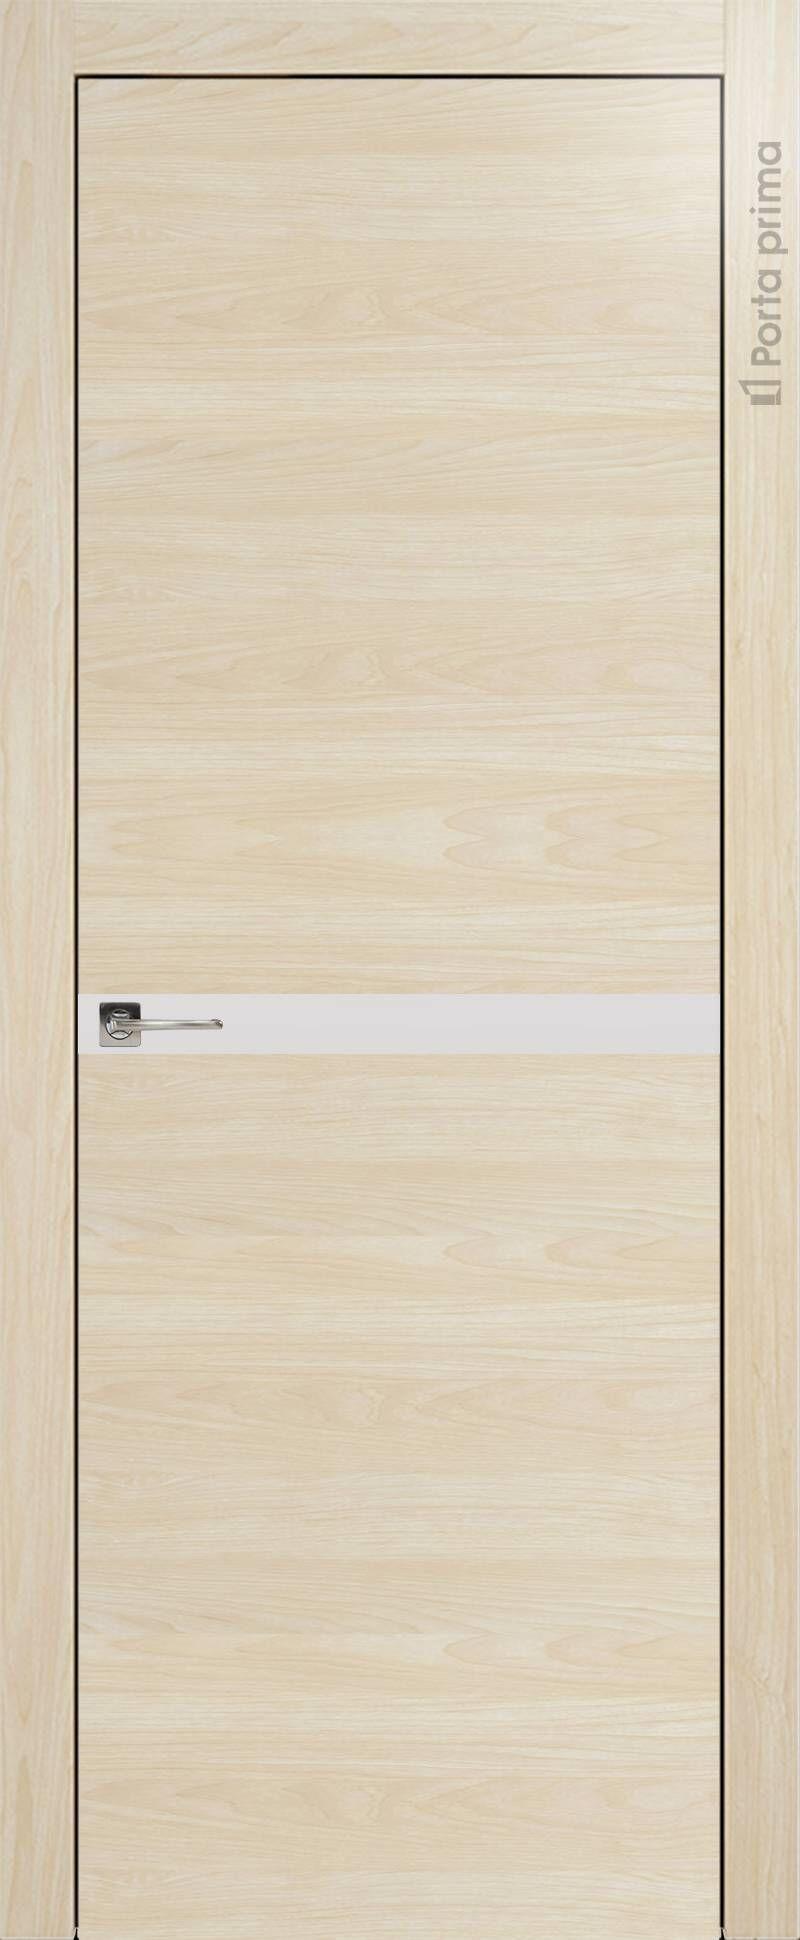 Tivoli Б-4 цвет - Клен Без стекла (ДГ)